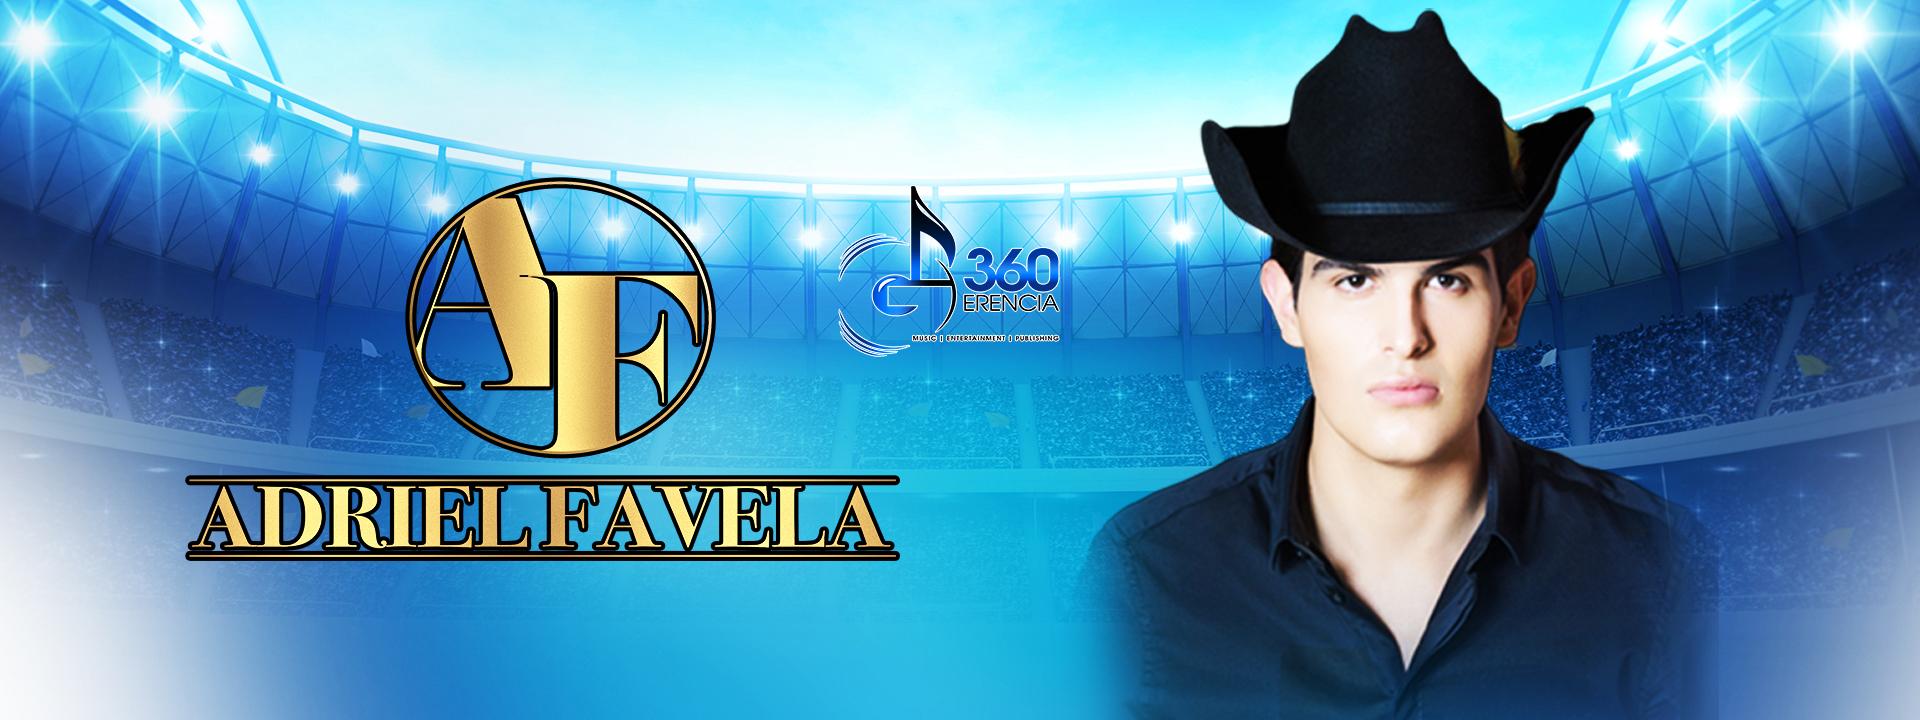 FM-ADRIEL-FAVELA